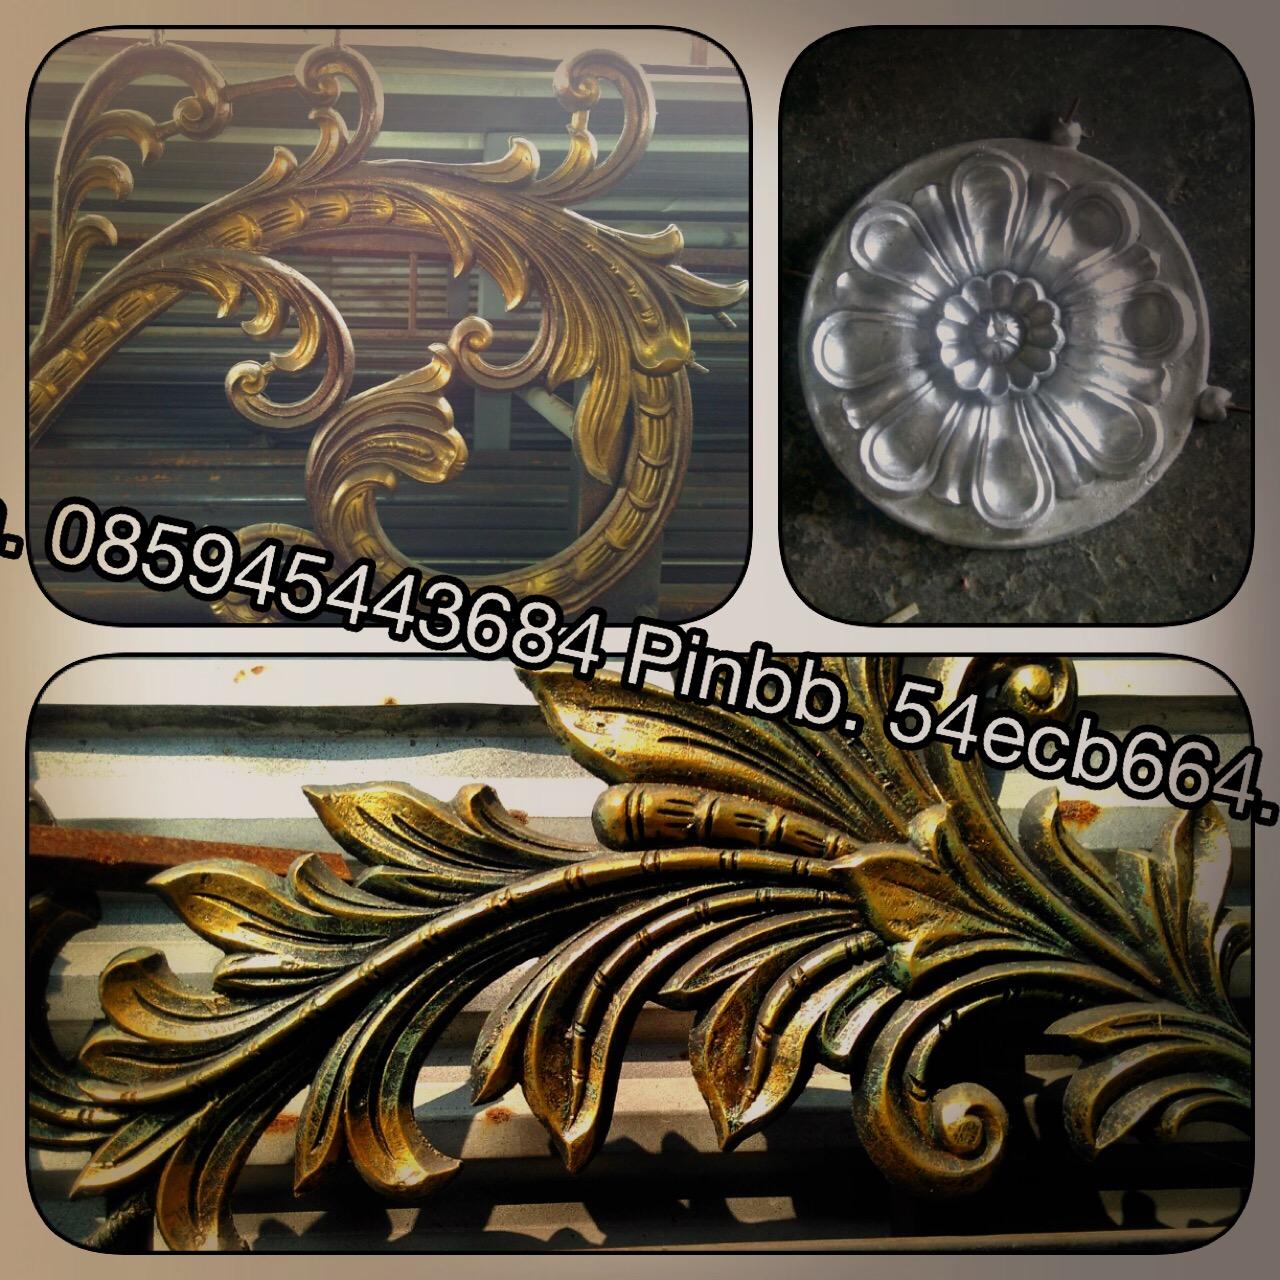 Wa. 085945443684 Pinbb. 54ecb664.